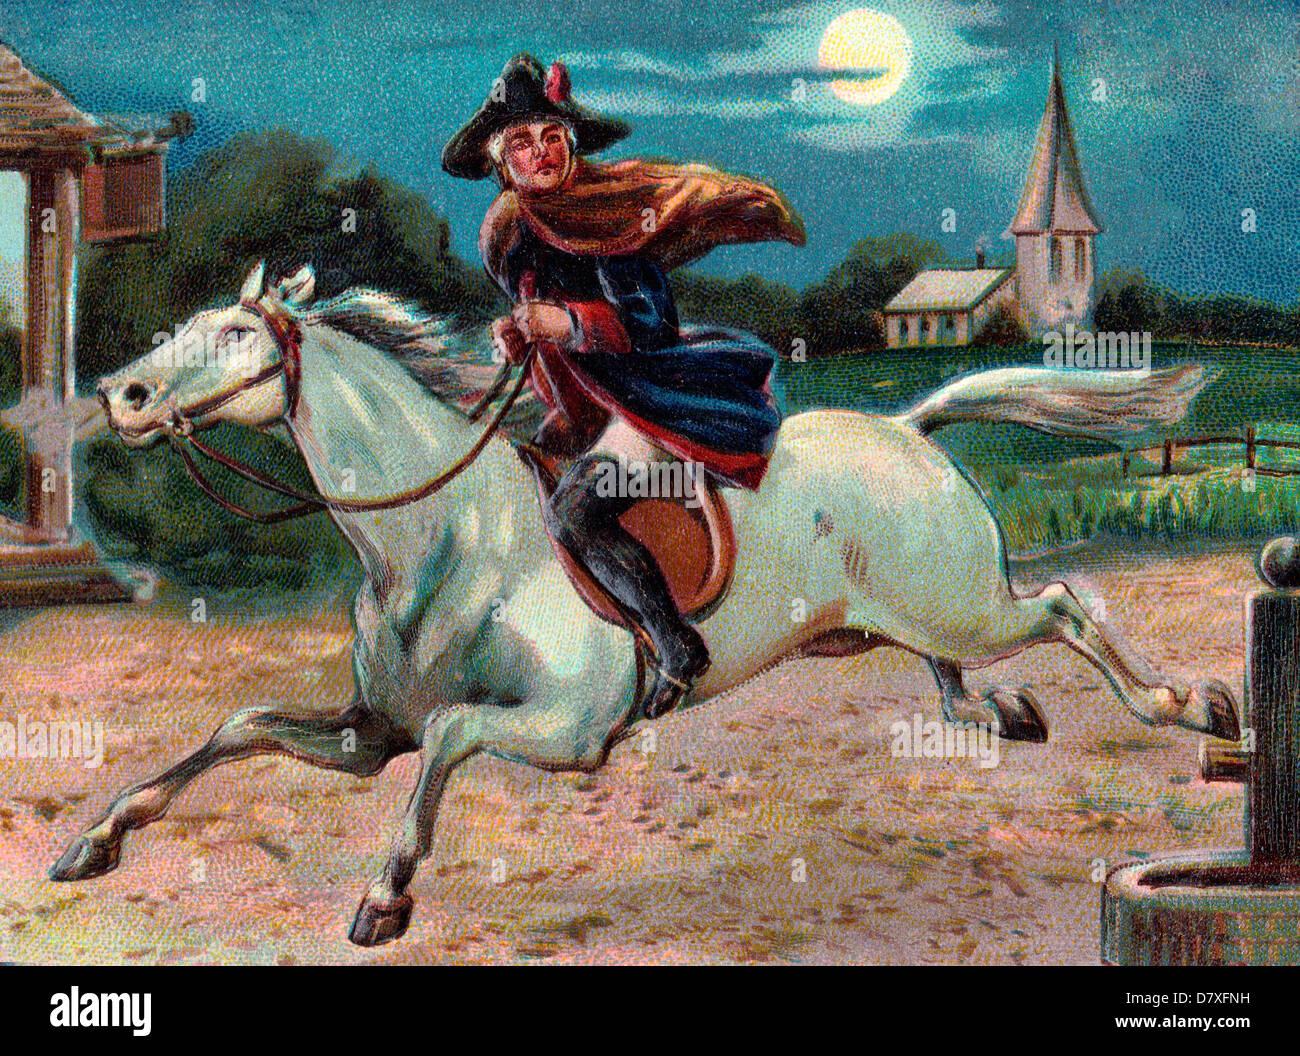 Paul Revere S Ride April 18 Stock Photo